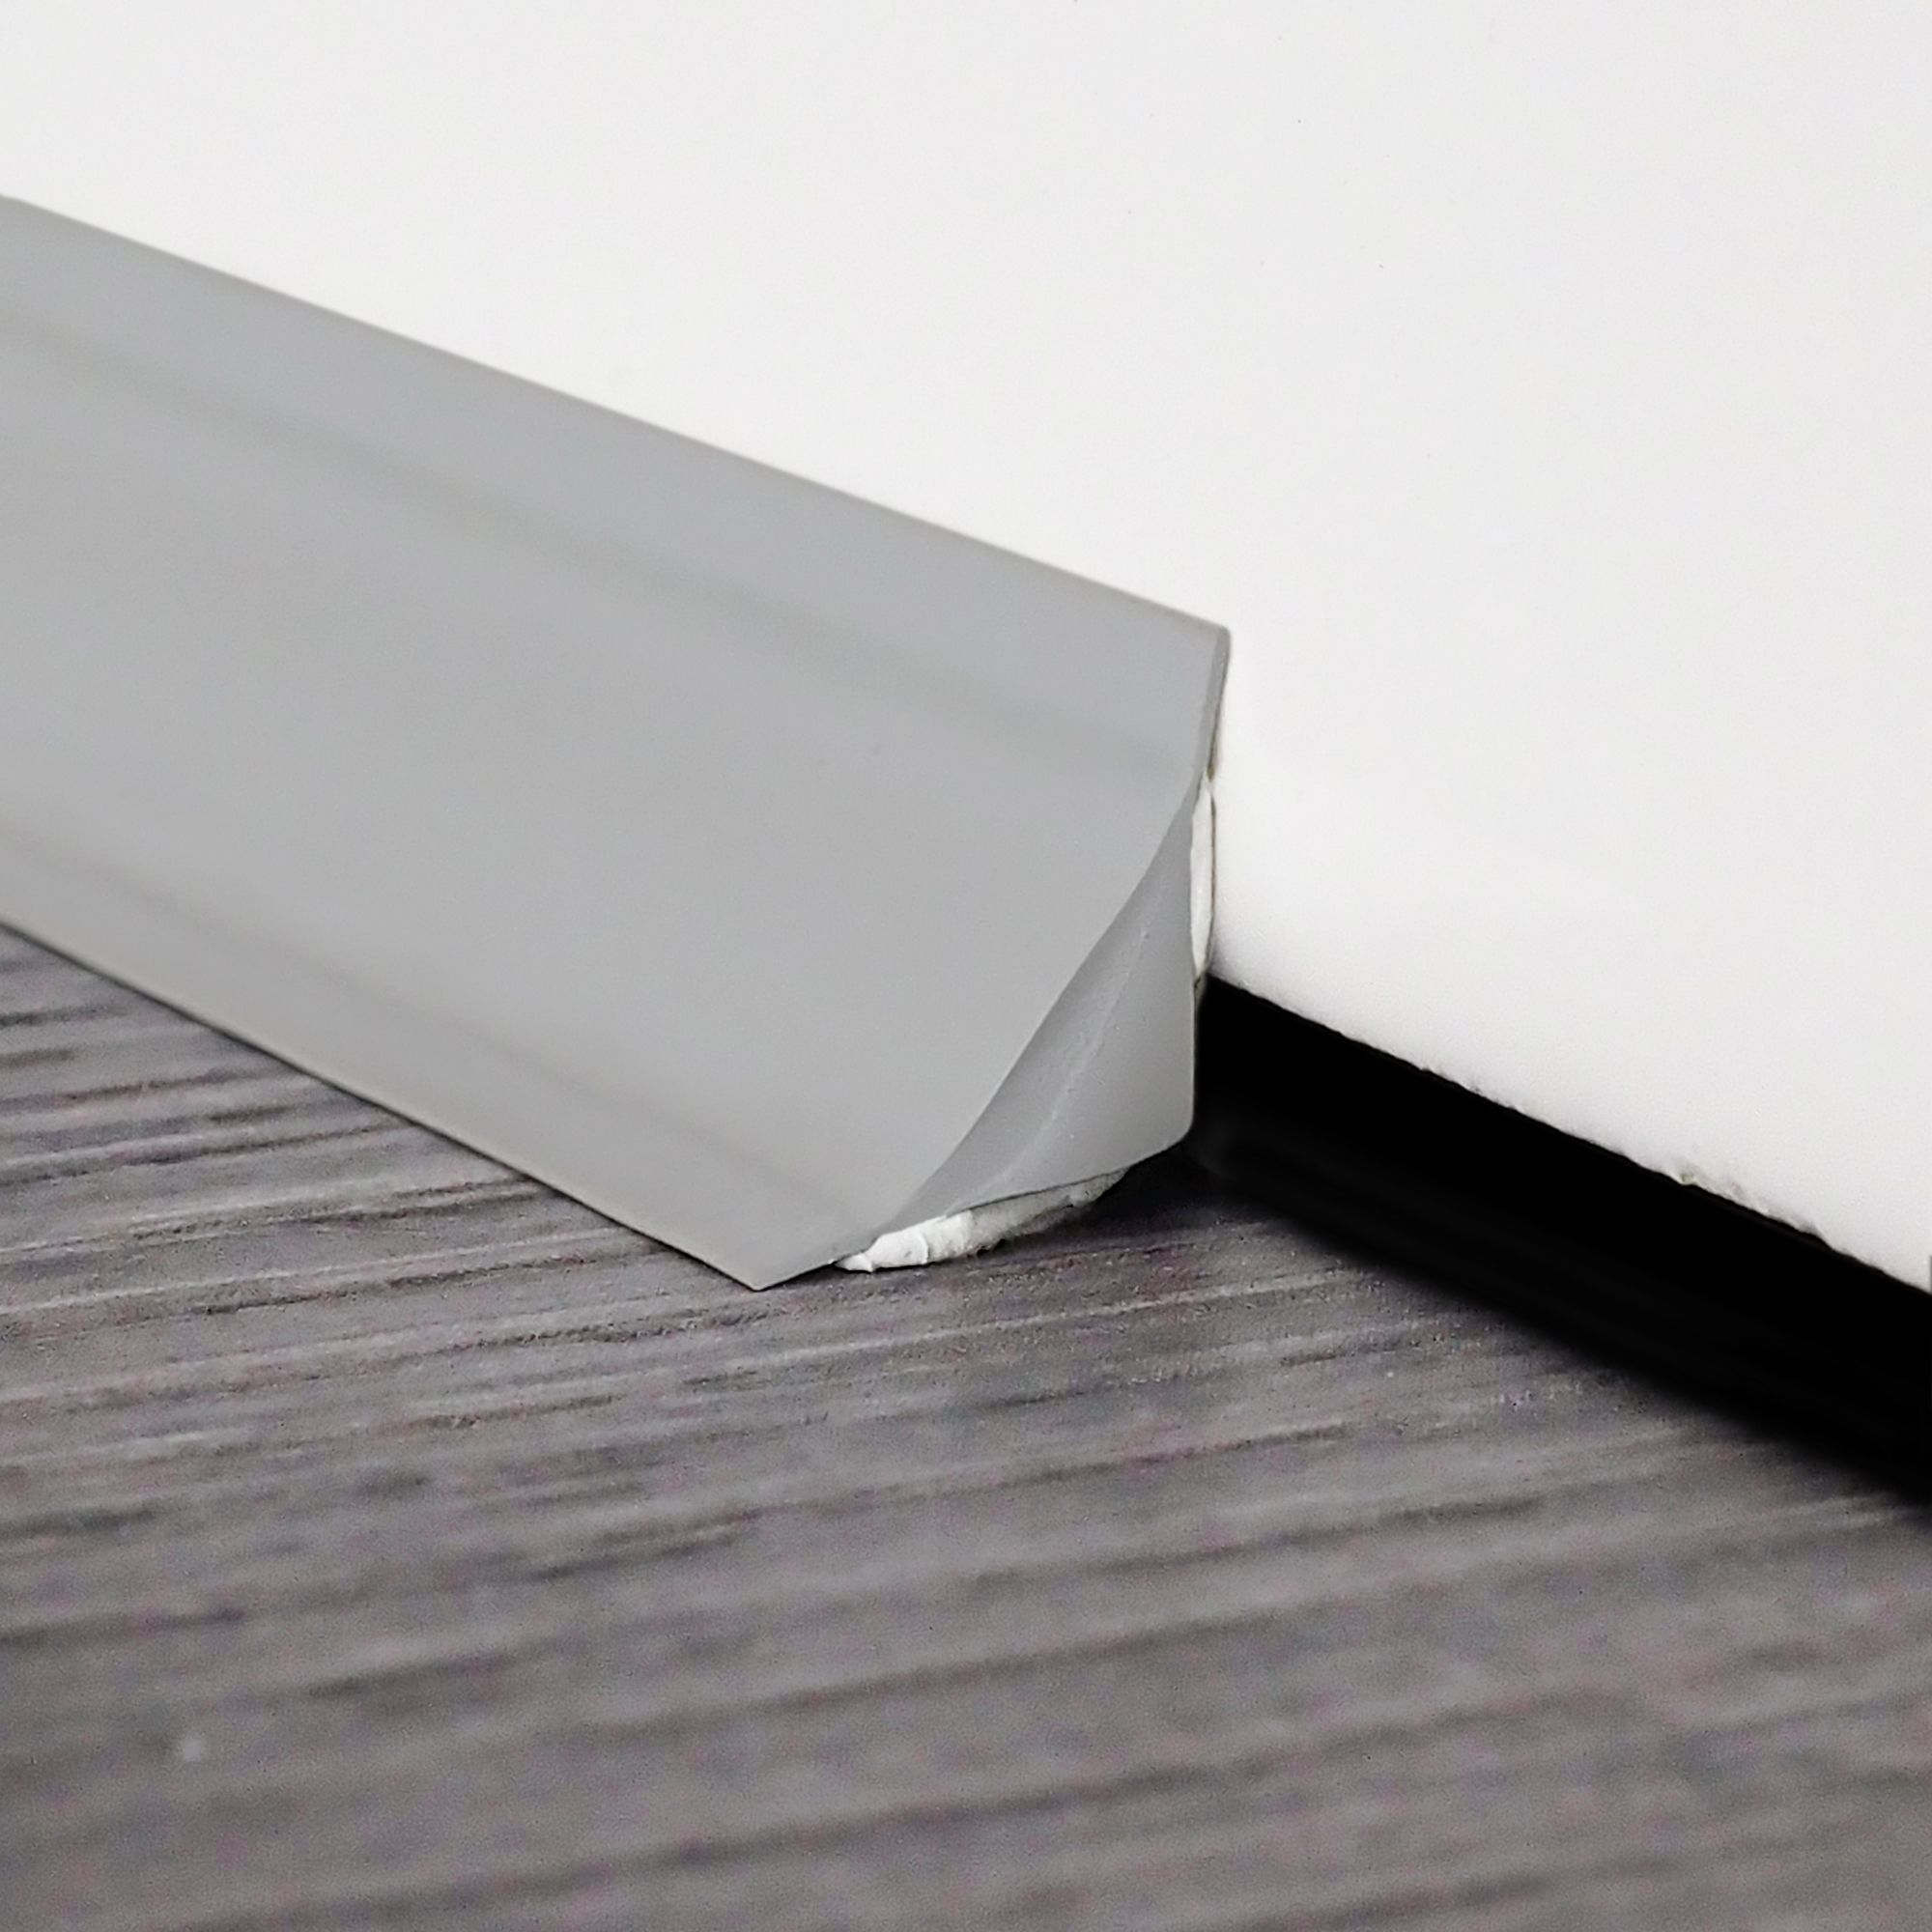 Instatrim 3 4 Flexible Trim Moulding Caulk Strips Gray 10 Ft 1 Pack Walmart Com Moldings And Trim Baseboards Flexible Molding